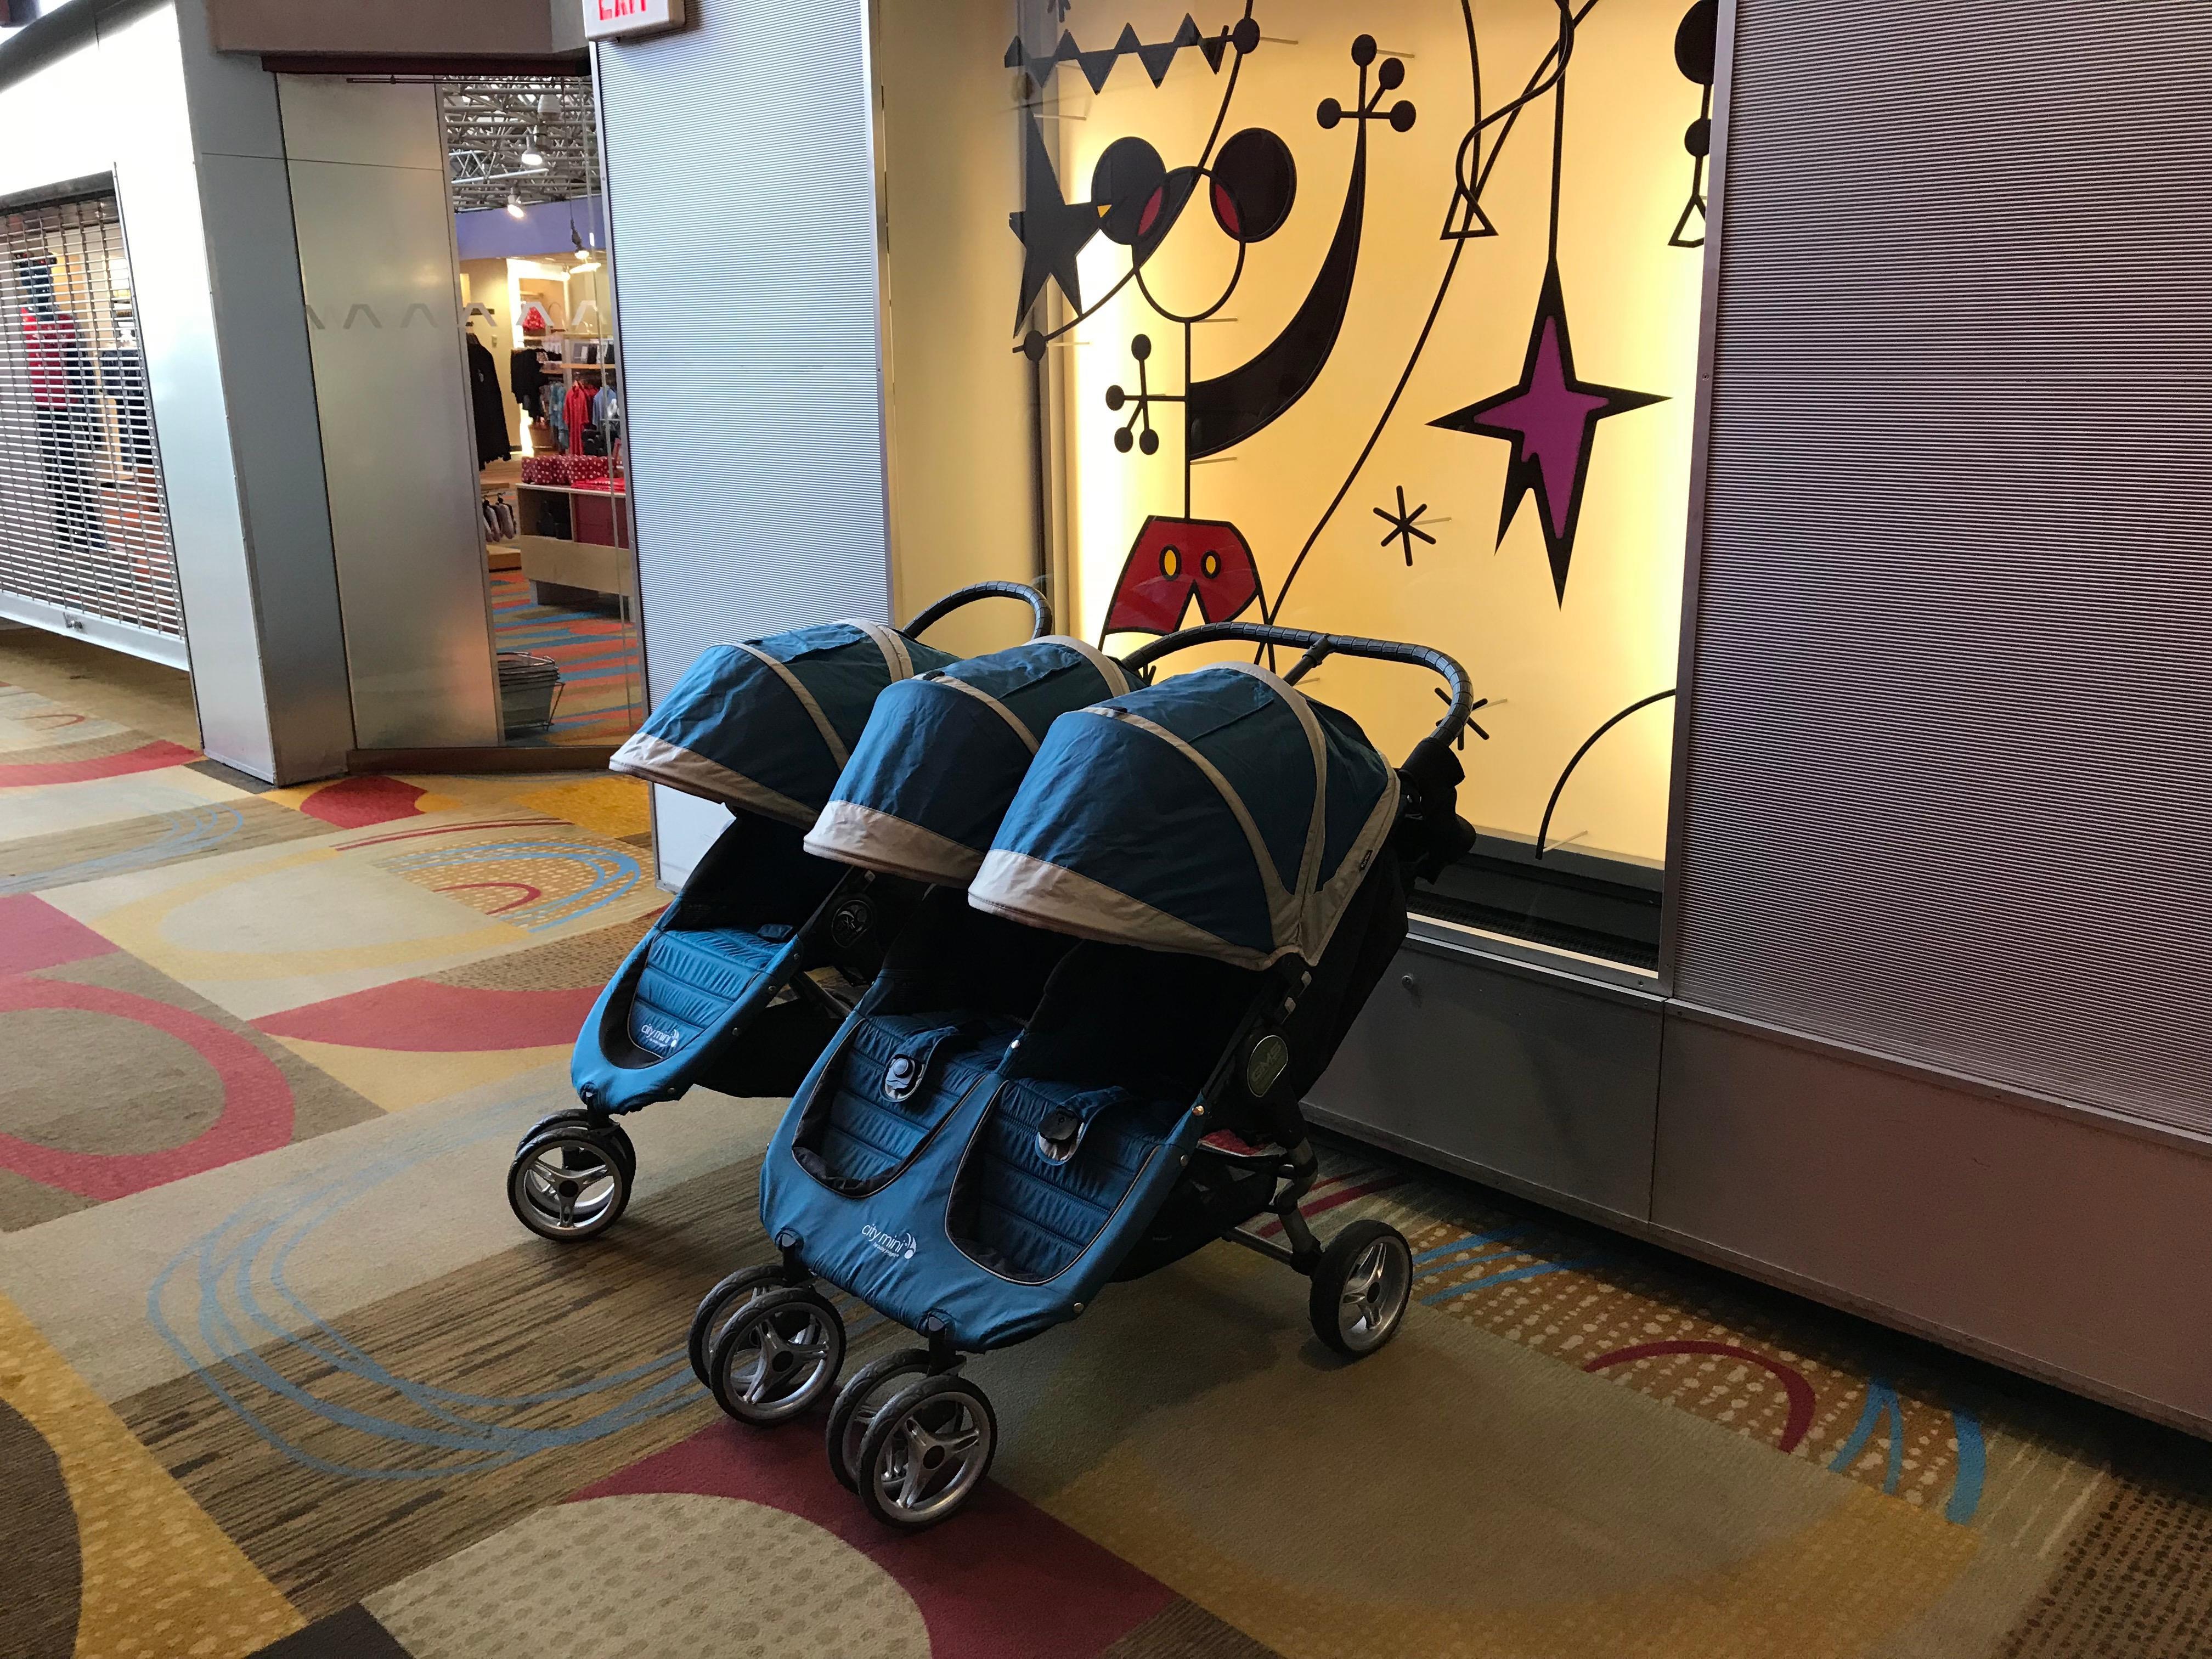 Stroller Rentals Disney image 80